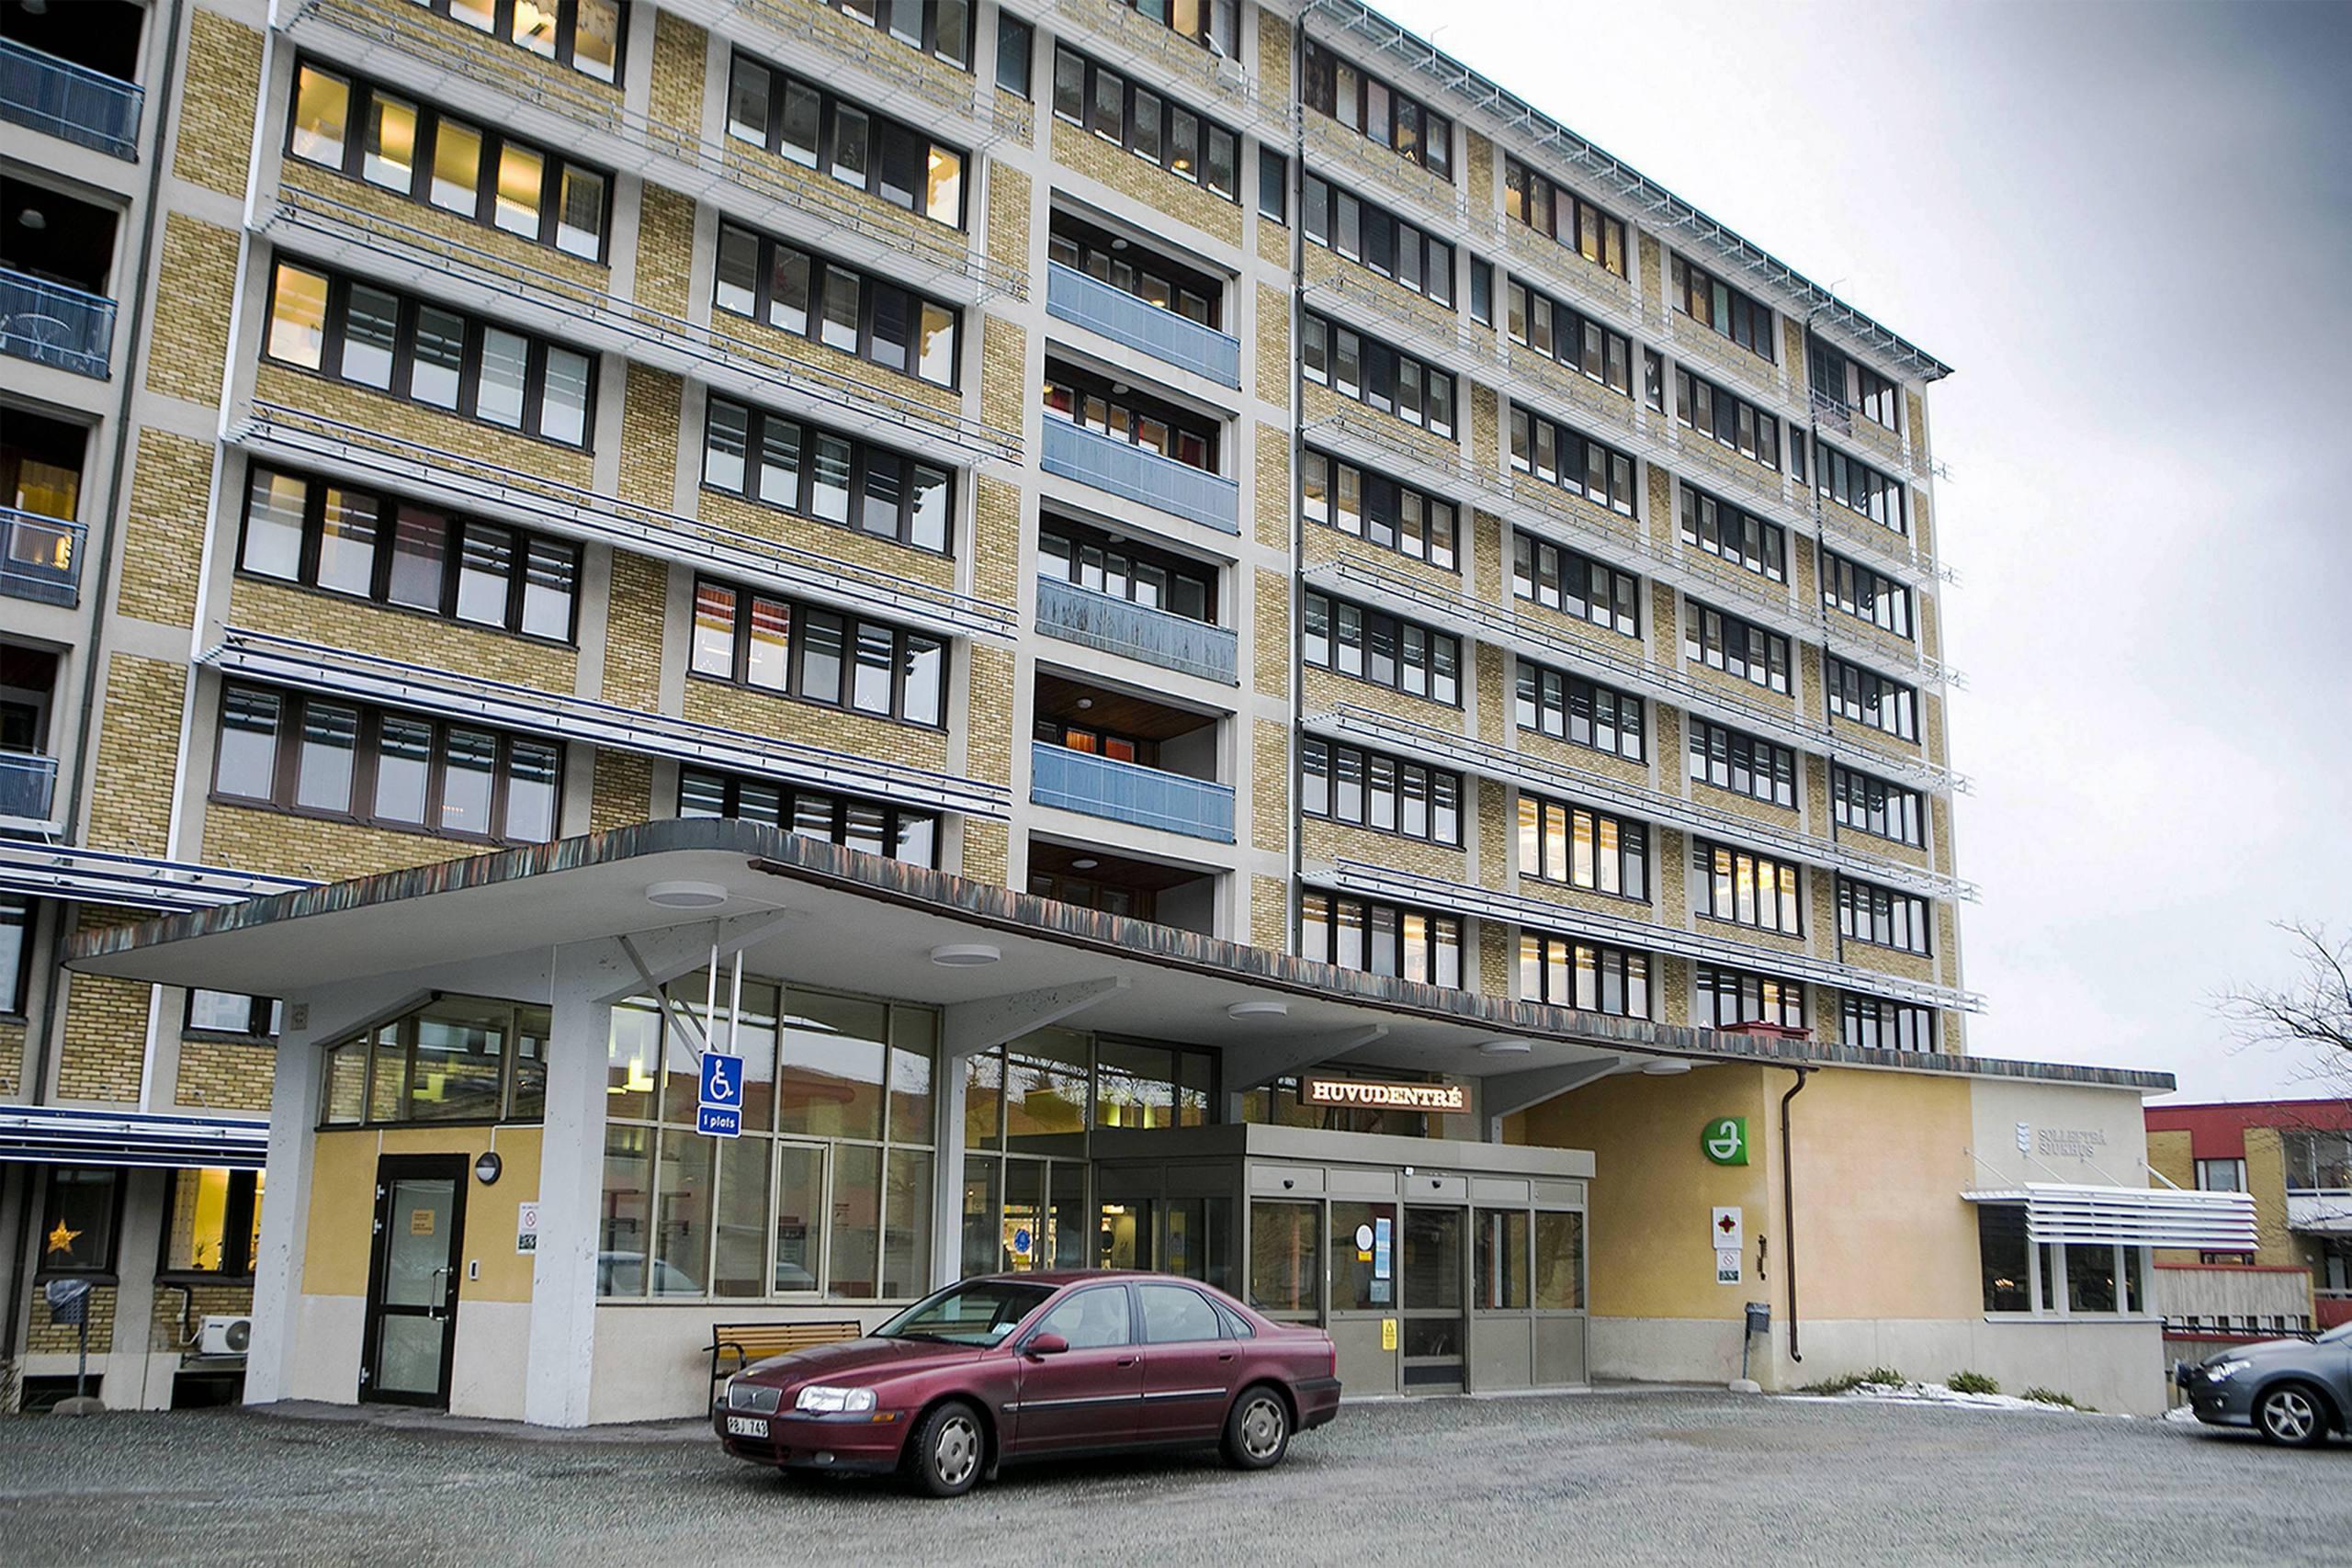 Landsting far salja mindre sjukhus